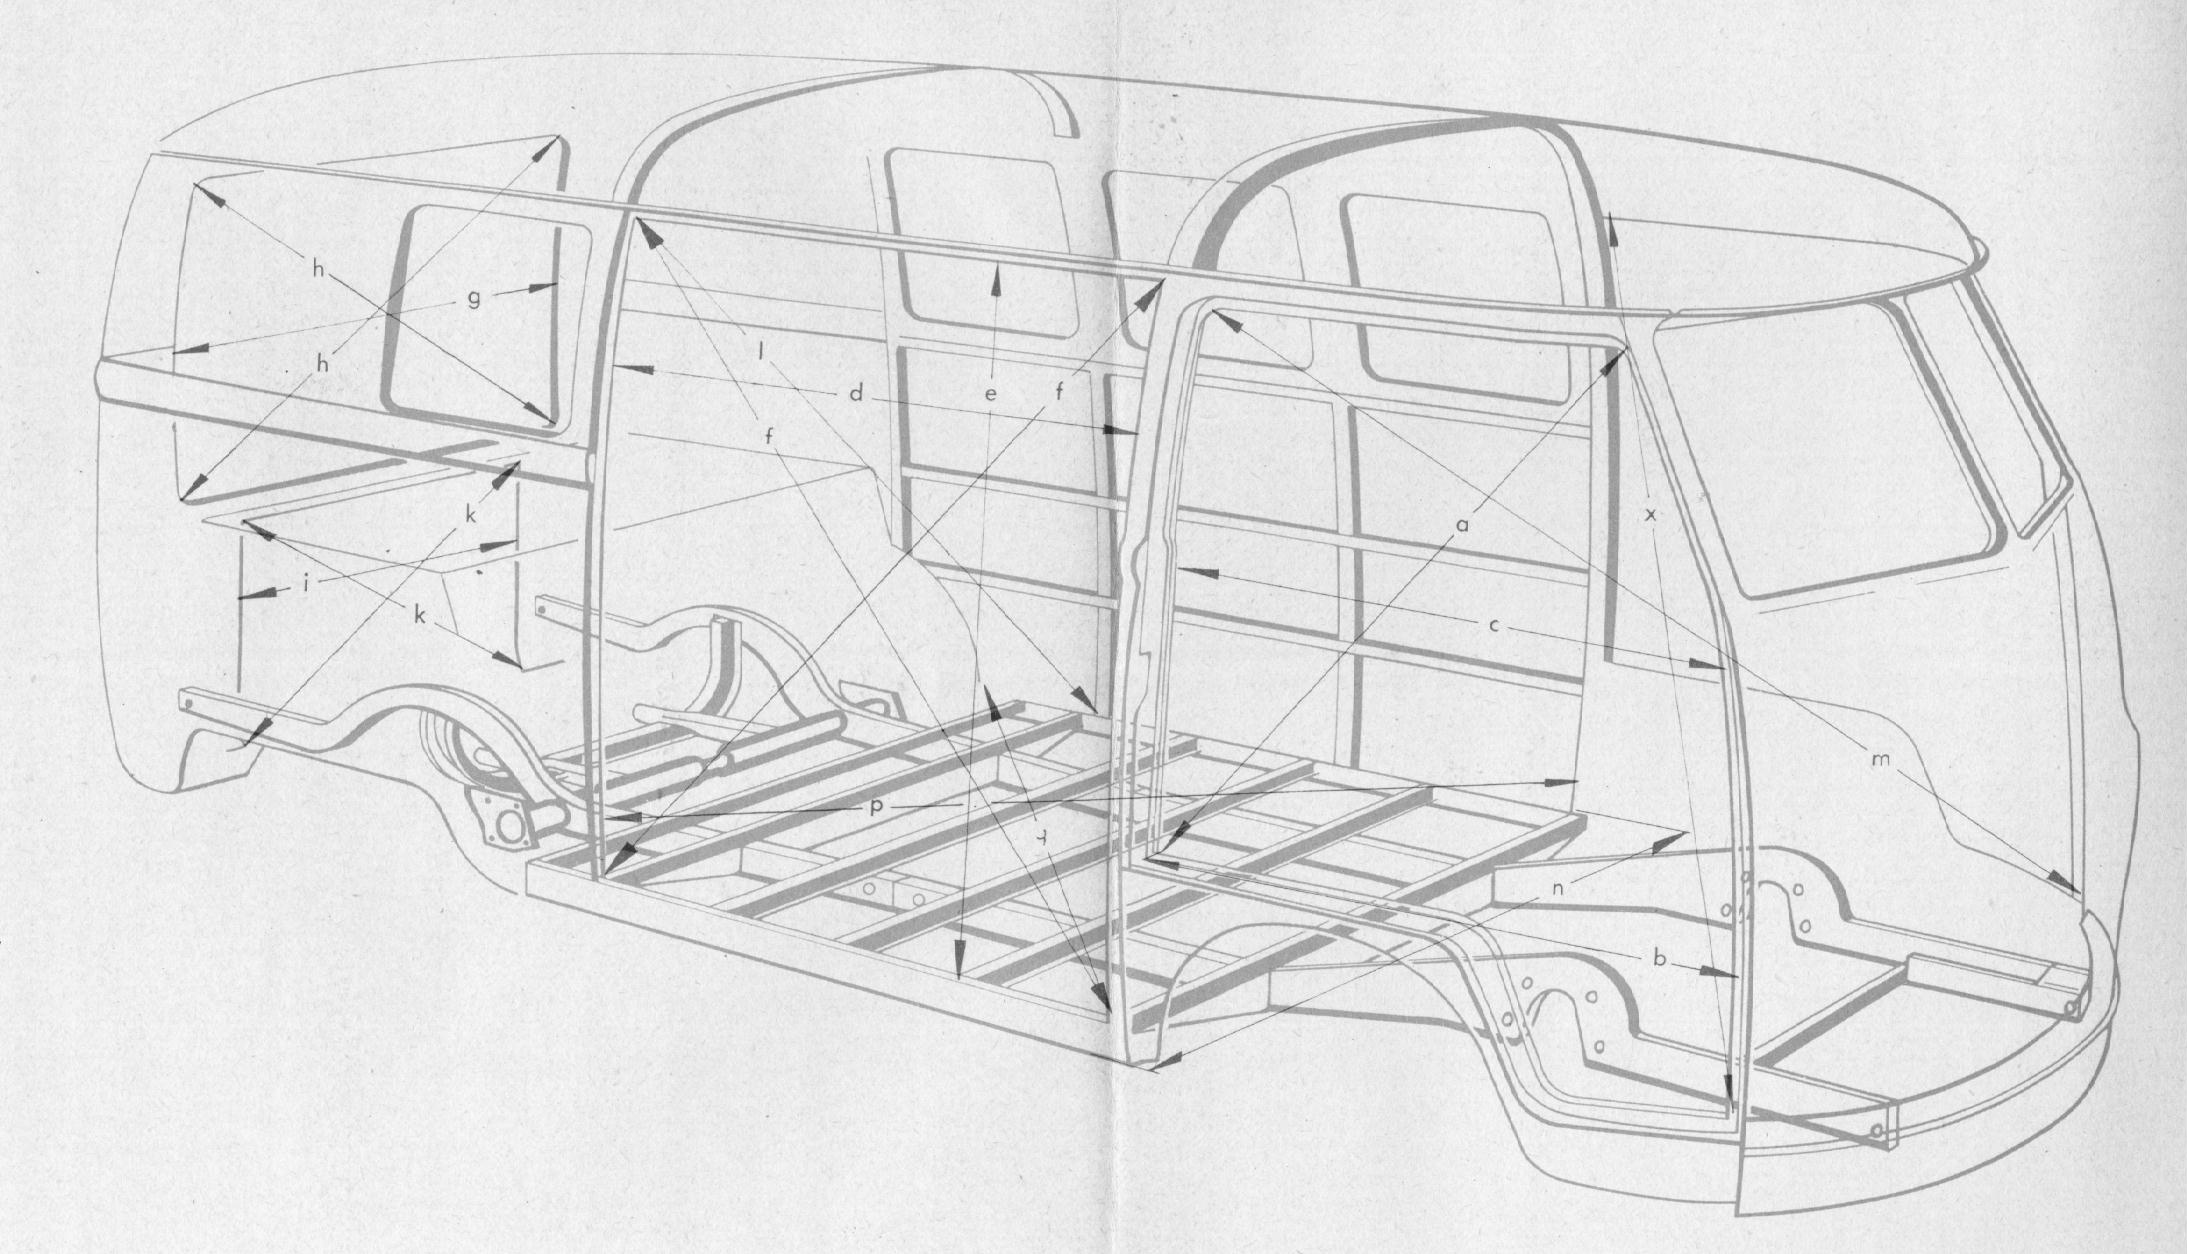 1022 X 740 159 Kb Jpeg Honda Rancher 350 Wiring Diagram Source